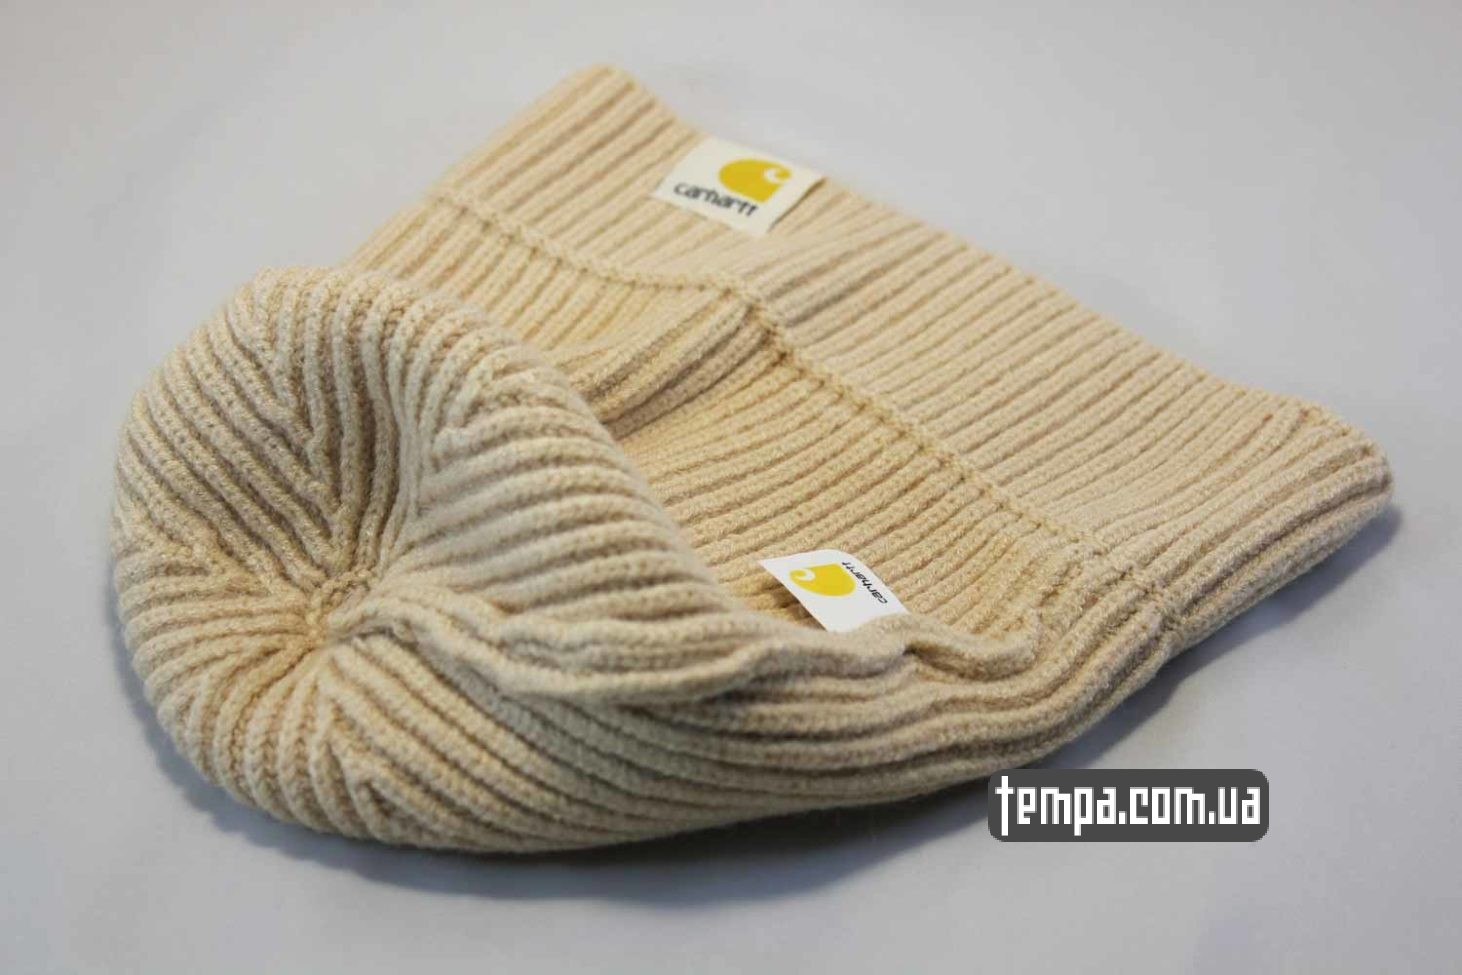 кархарт украина магазин шапка beanie Carhartt бежевая купить Украина